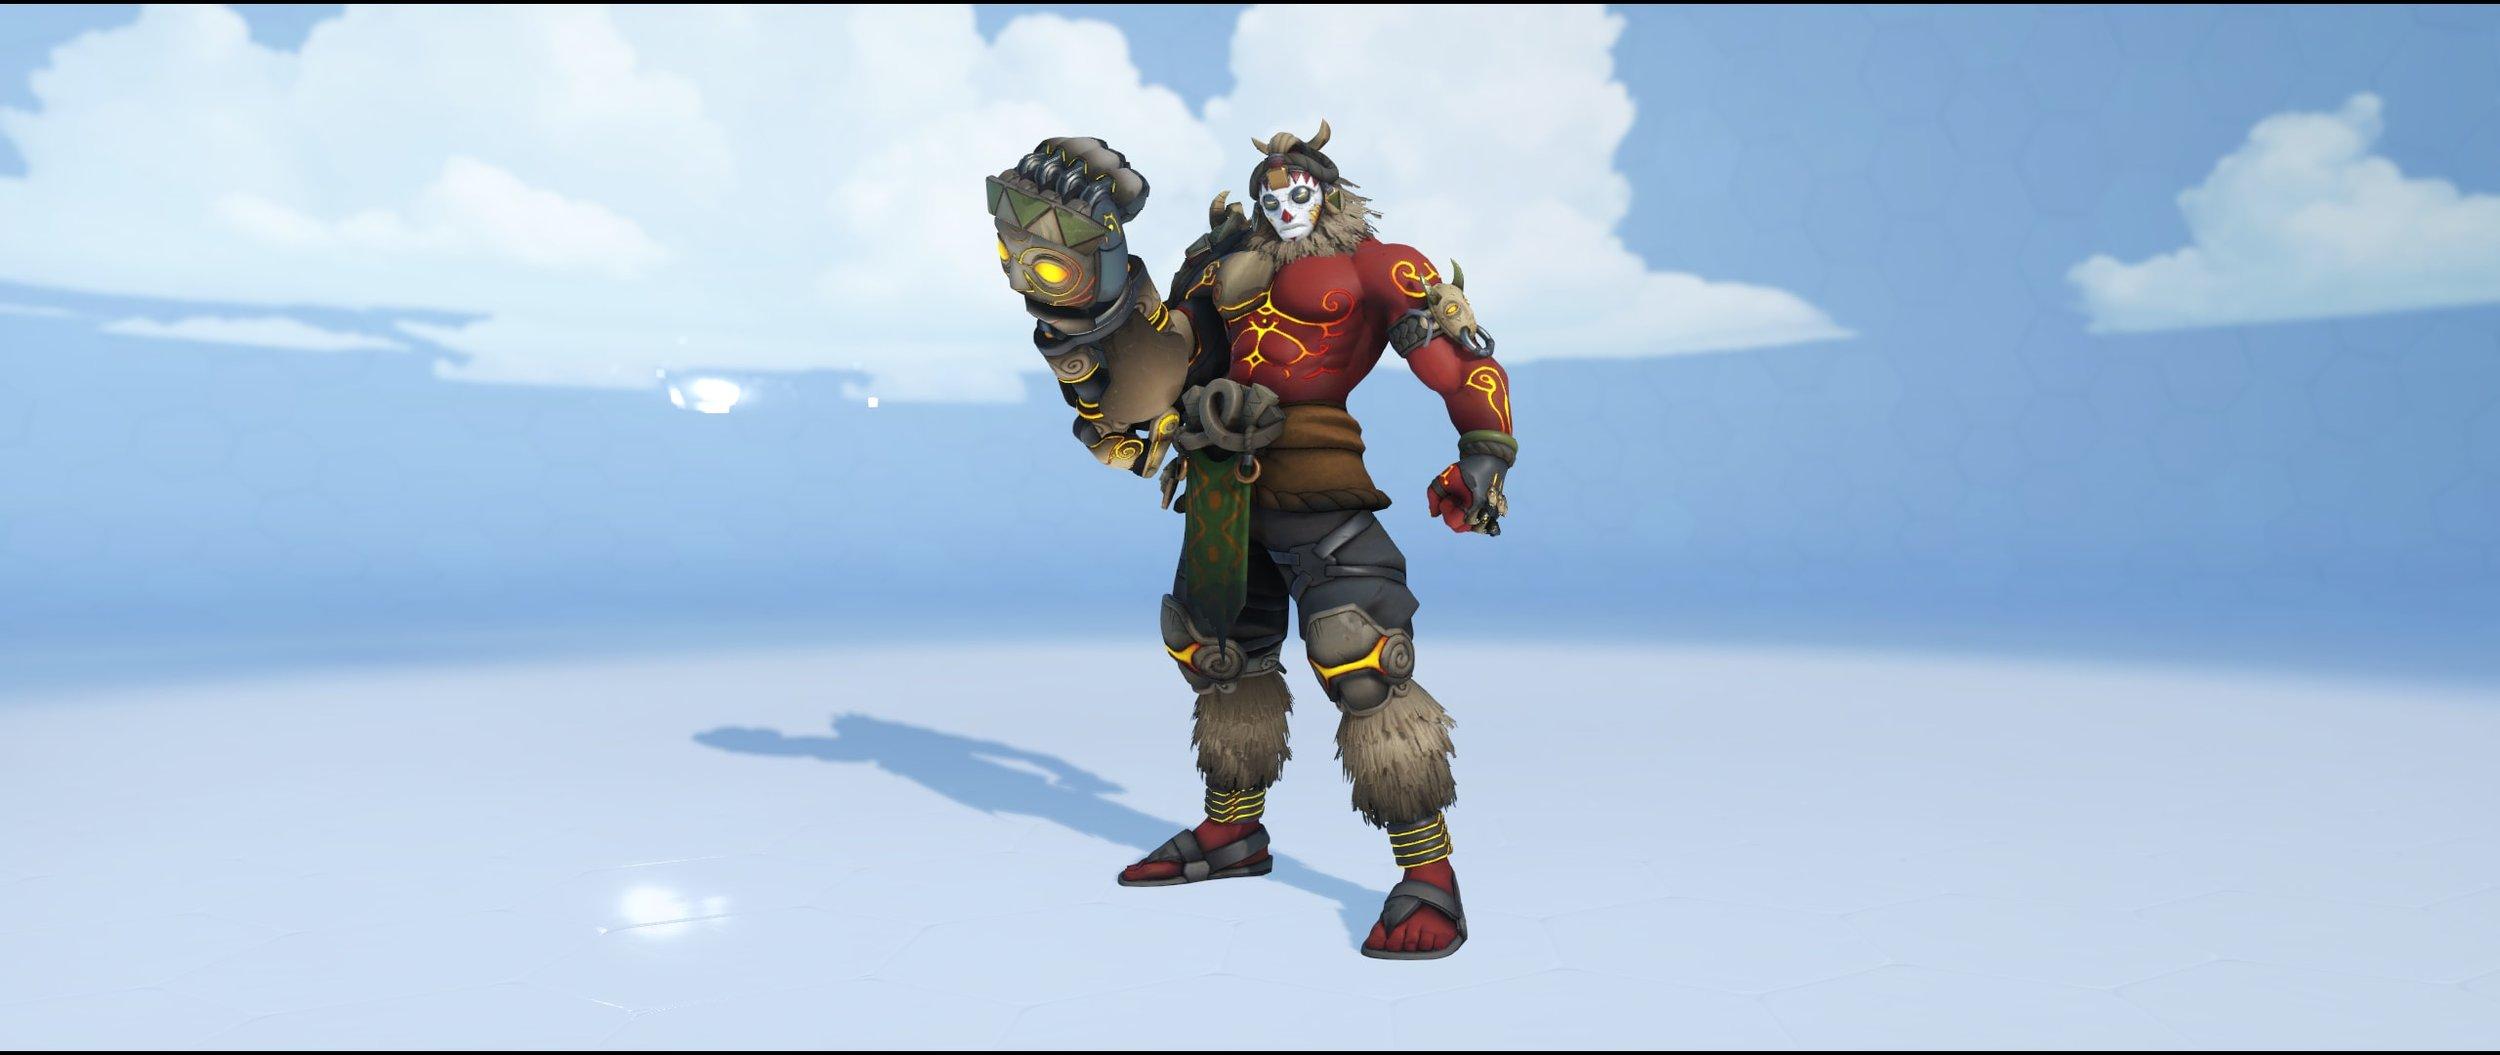 Avatar front legendary skin Doomfist Overwatch.jpg